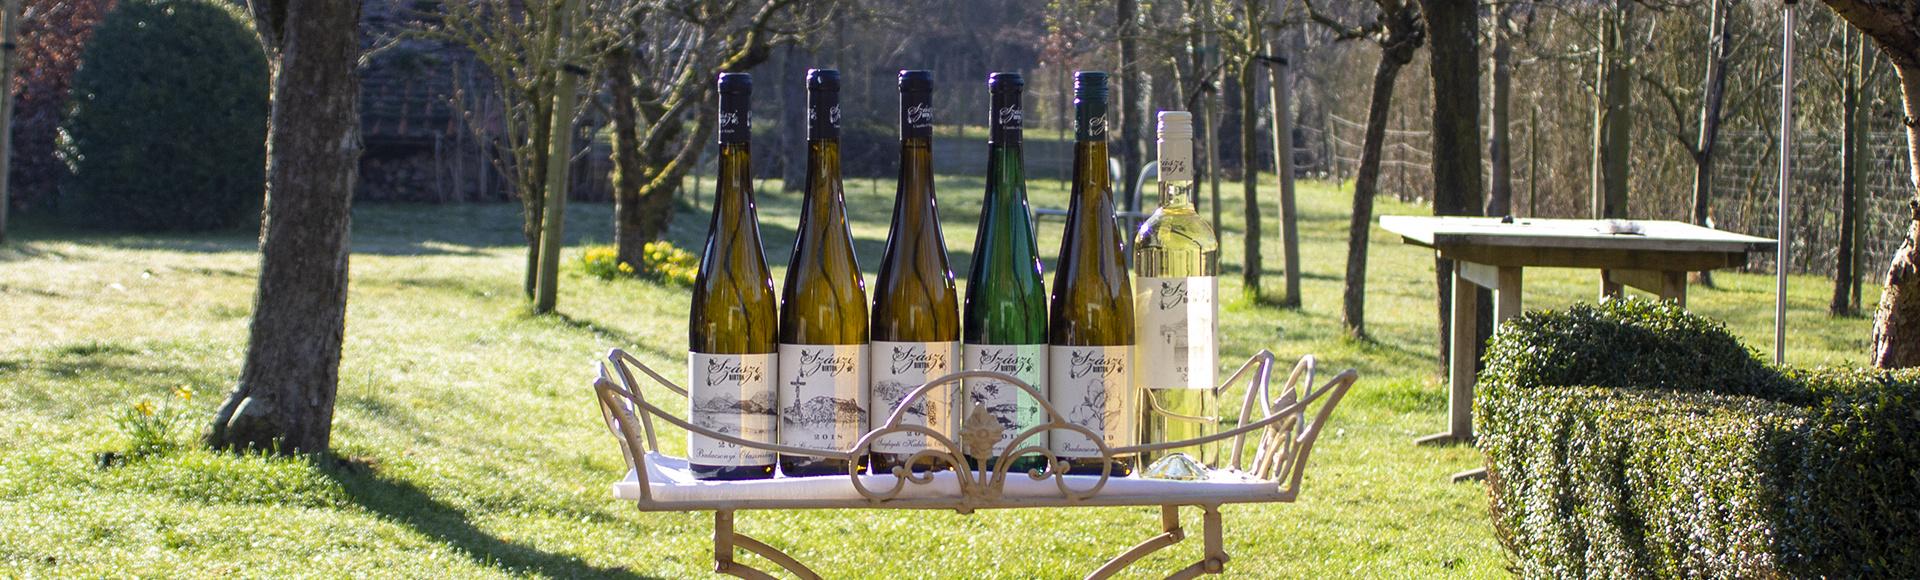 6 bio wijnen uit Badacsony